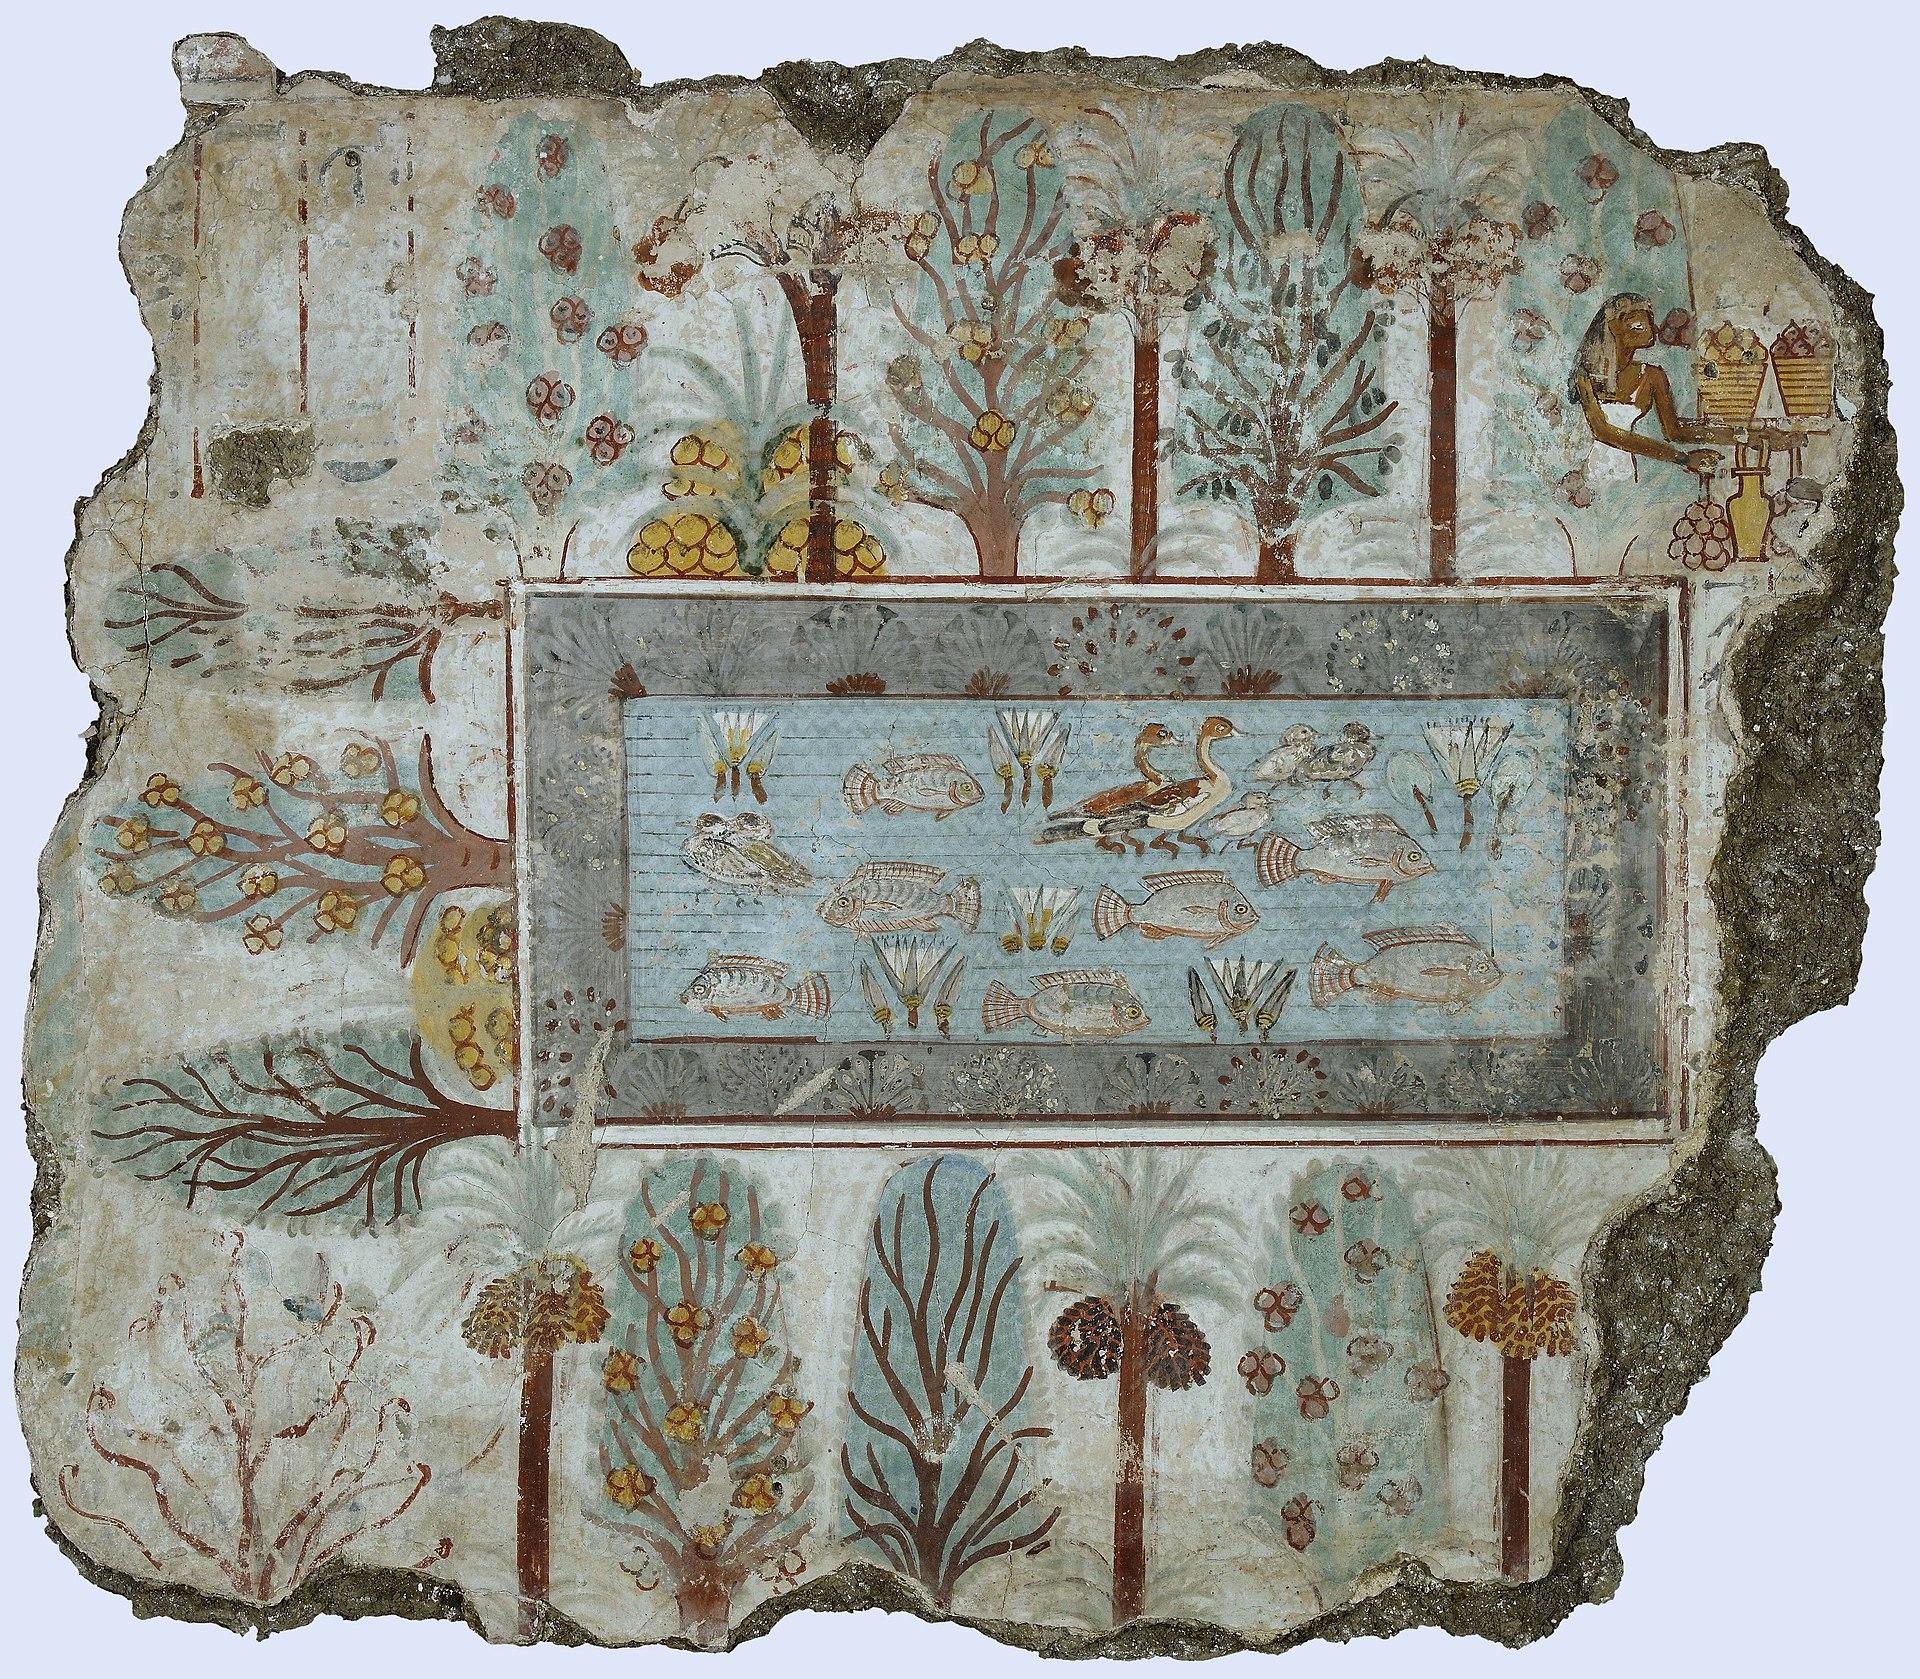 gartenkunst im alten gypten wikipedia. Black Bedroom Furniture Sets. Home Design Ideas